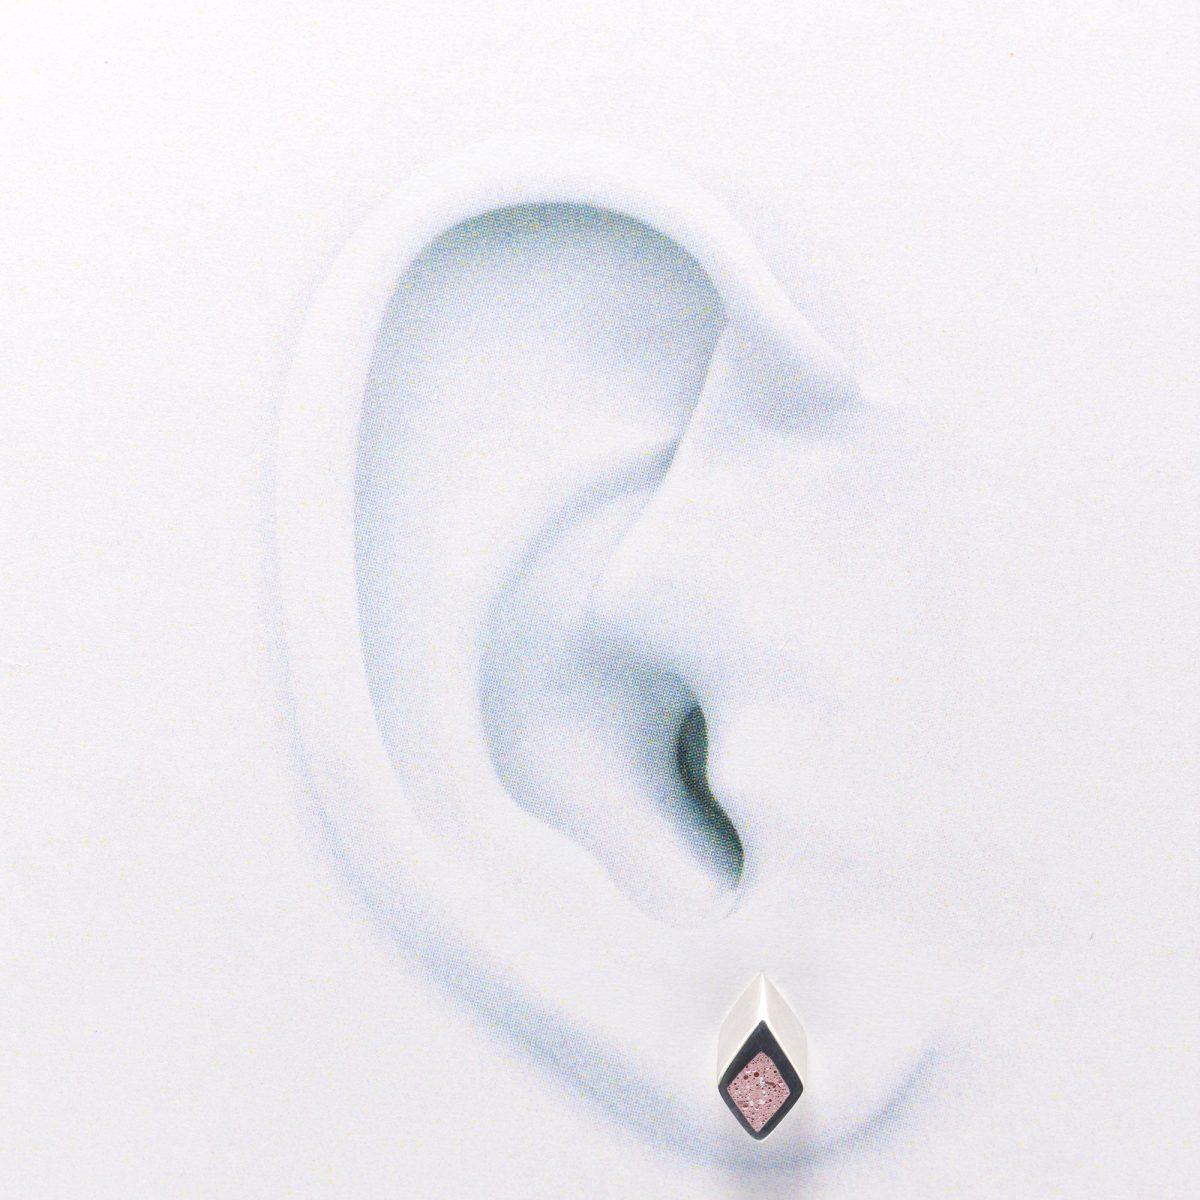 bijoux-1981-172